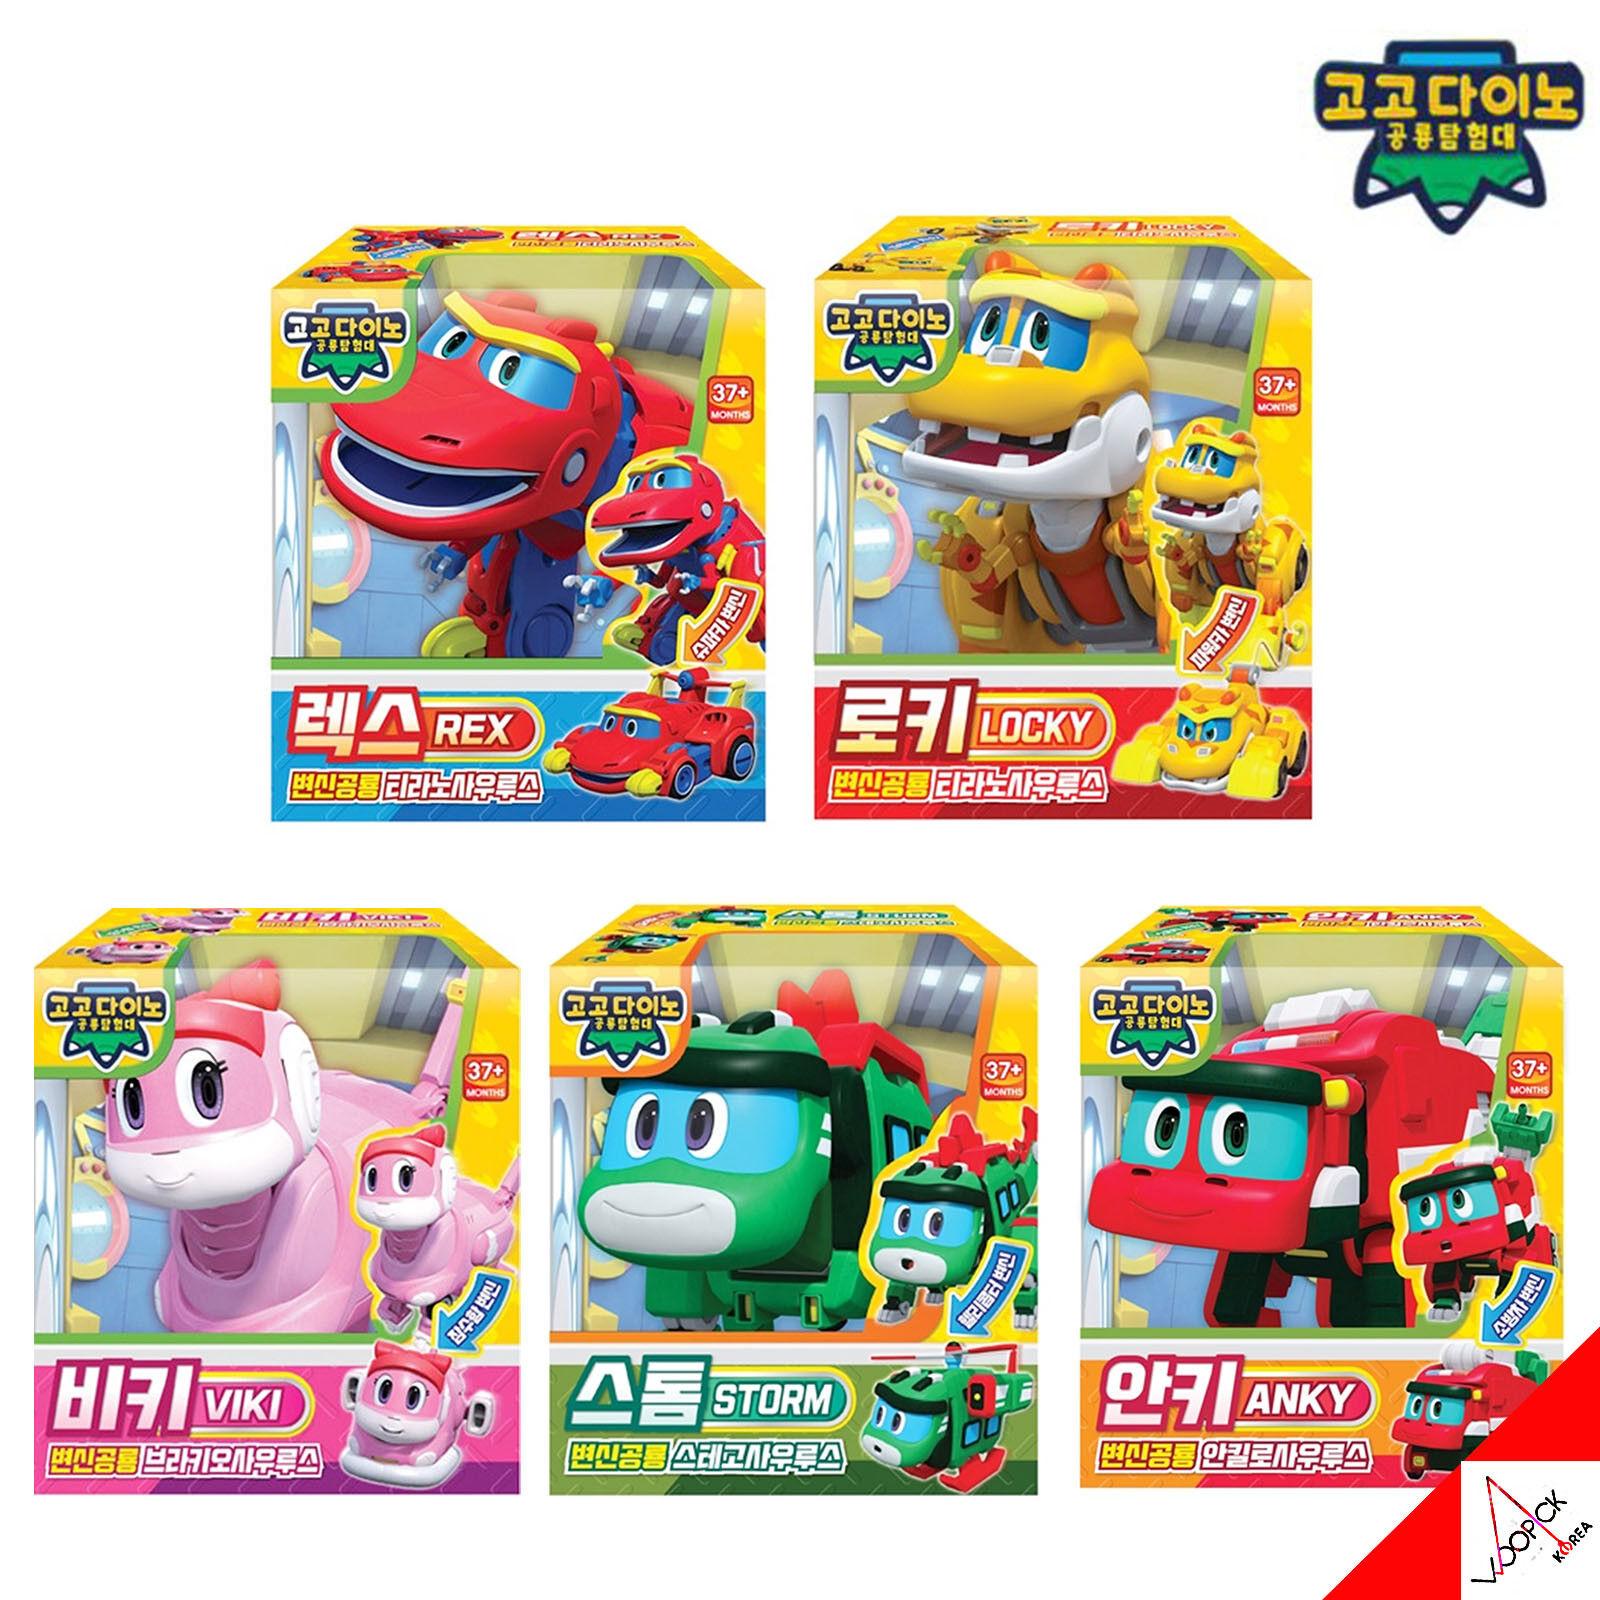 Gogo Dino Mini 5 pcs Robots Toy Set-Dinosaur Transformer Robot Korea Authentic